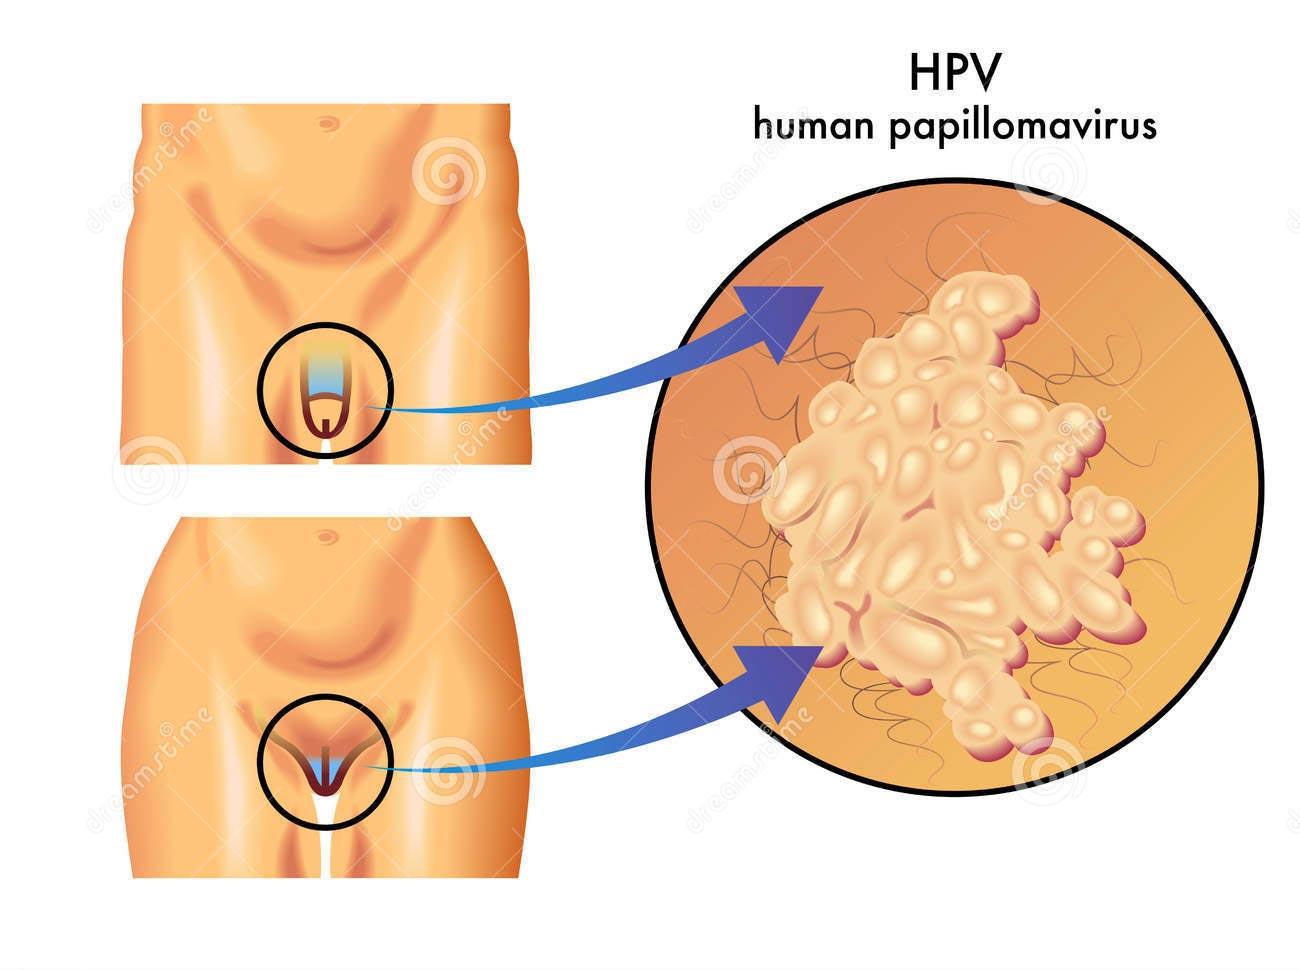 Sintomi del papilloma virus nell uomo - Sintomi nelluomo del papilloma virus - Category: DEFAULT